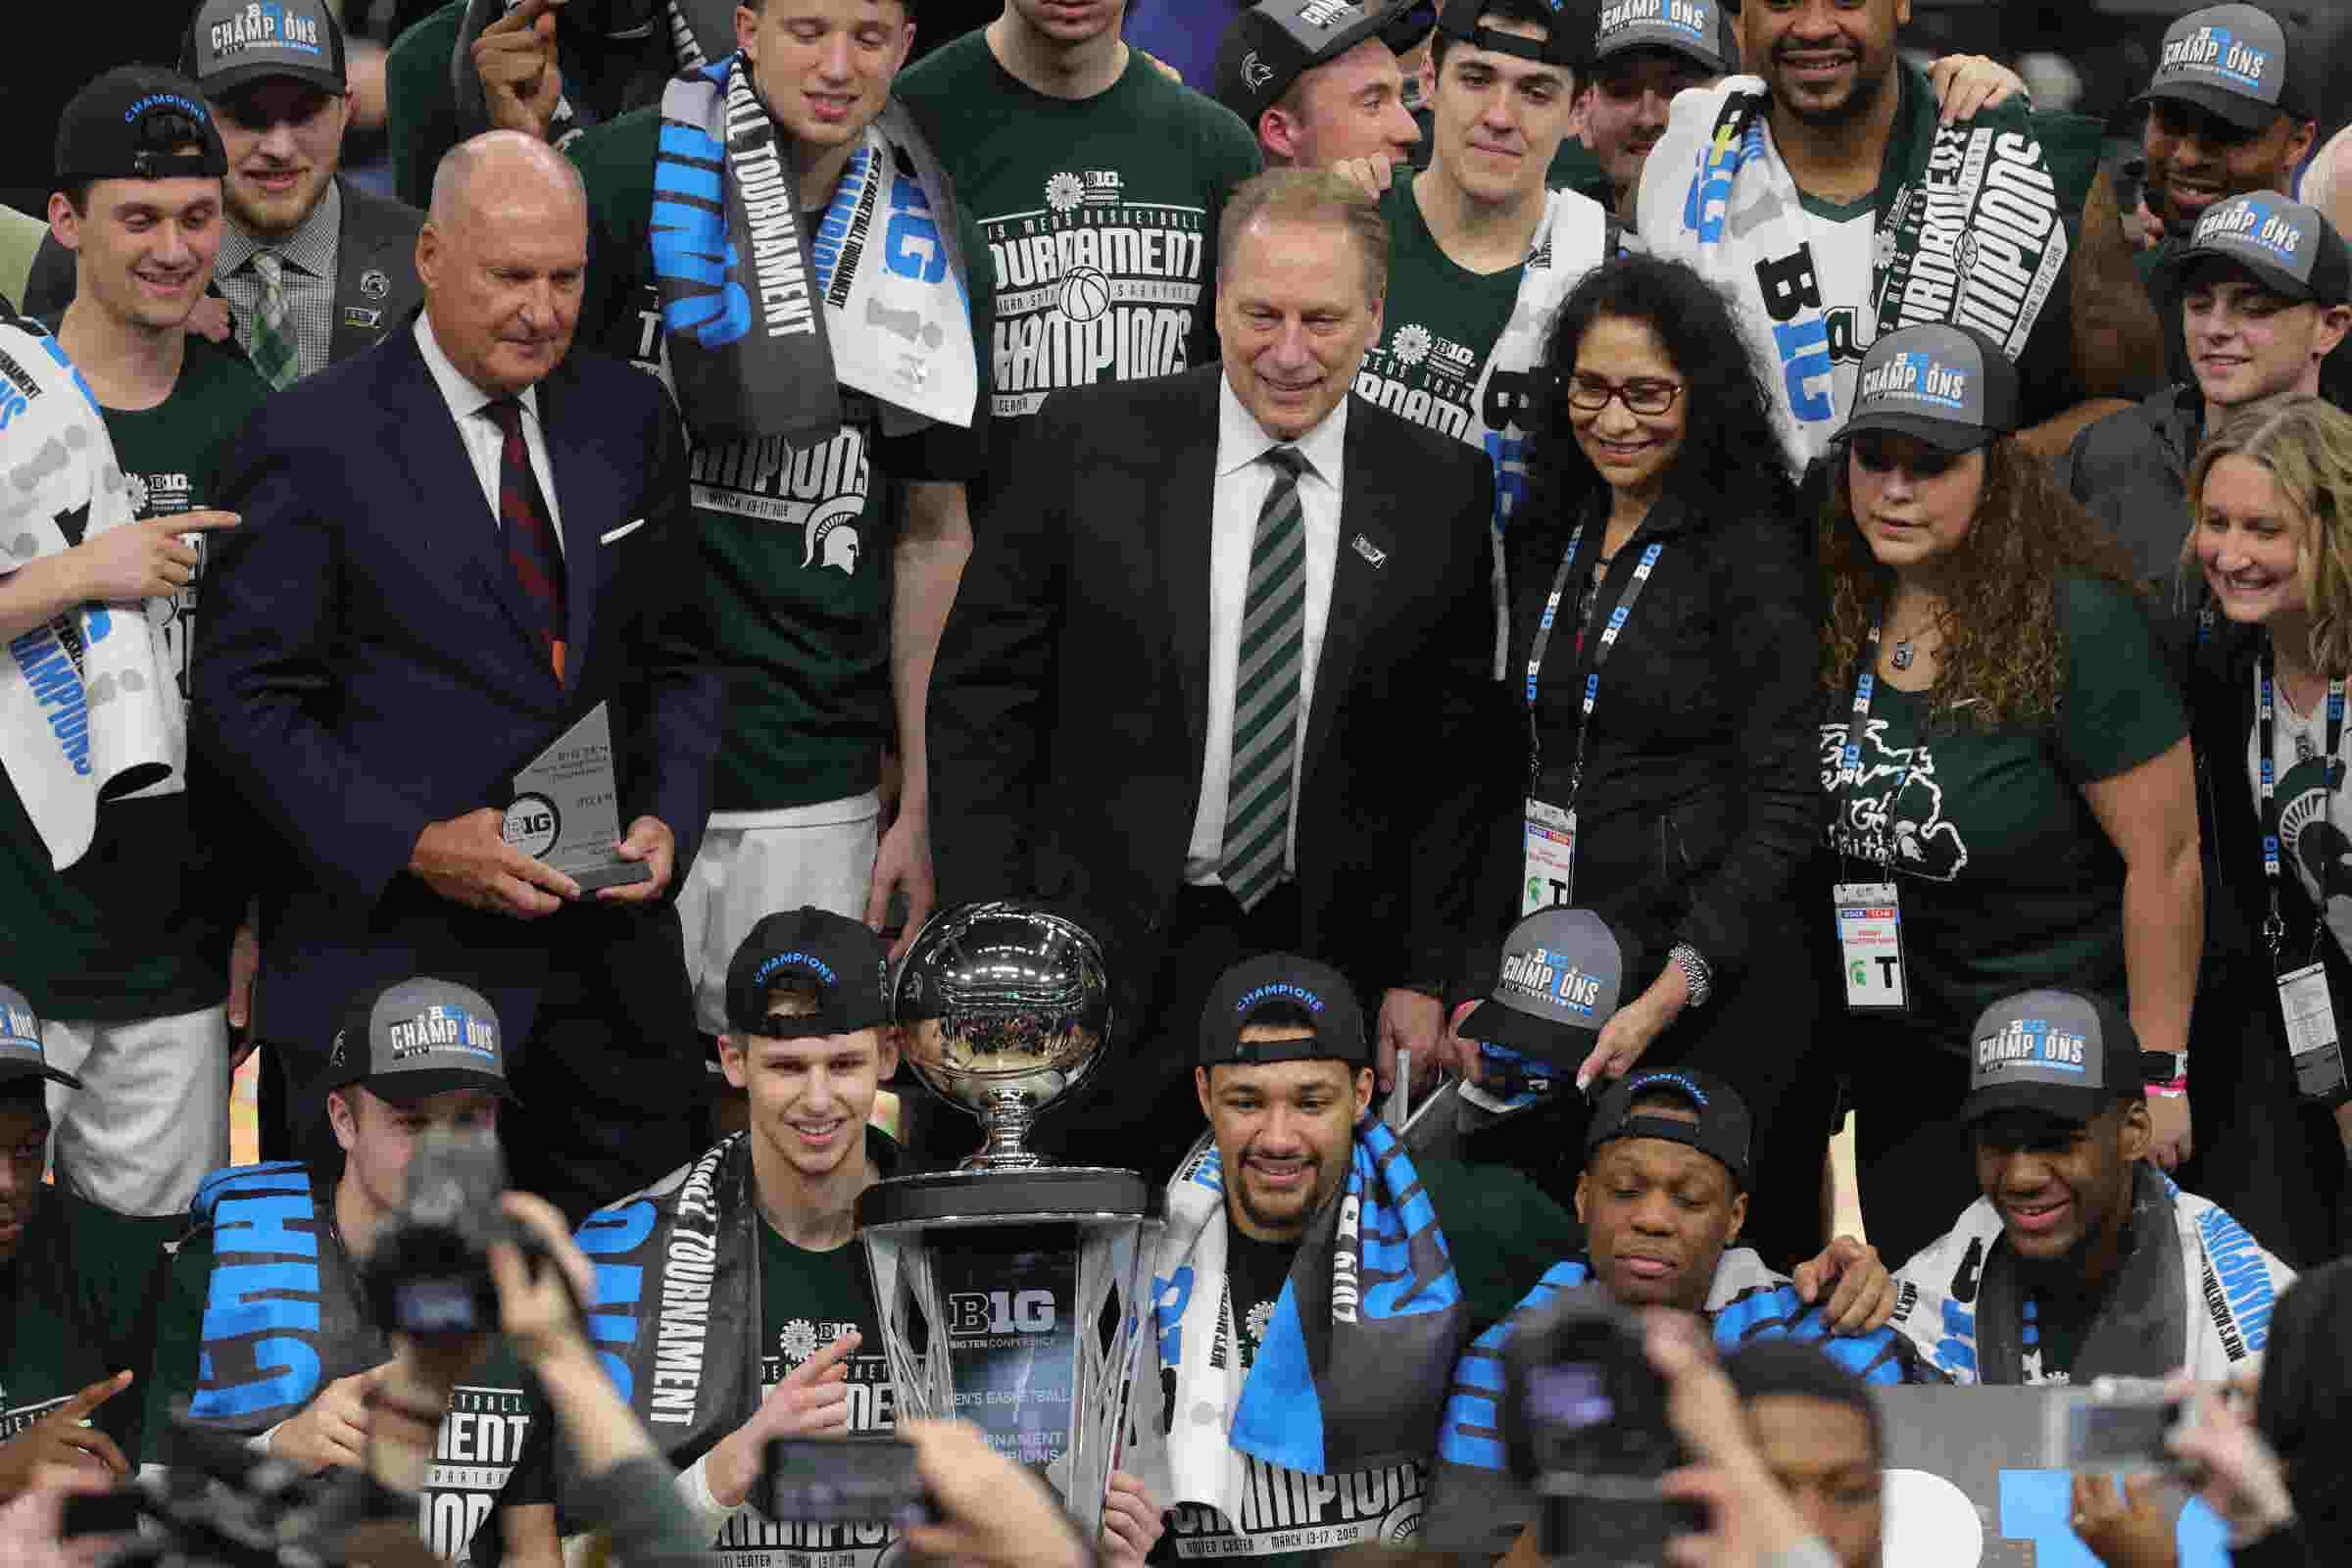 Michigan State celebrates gritty Big Ten tournament title victory over  Michigan